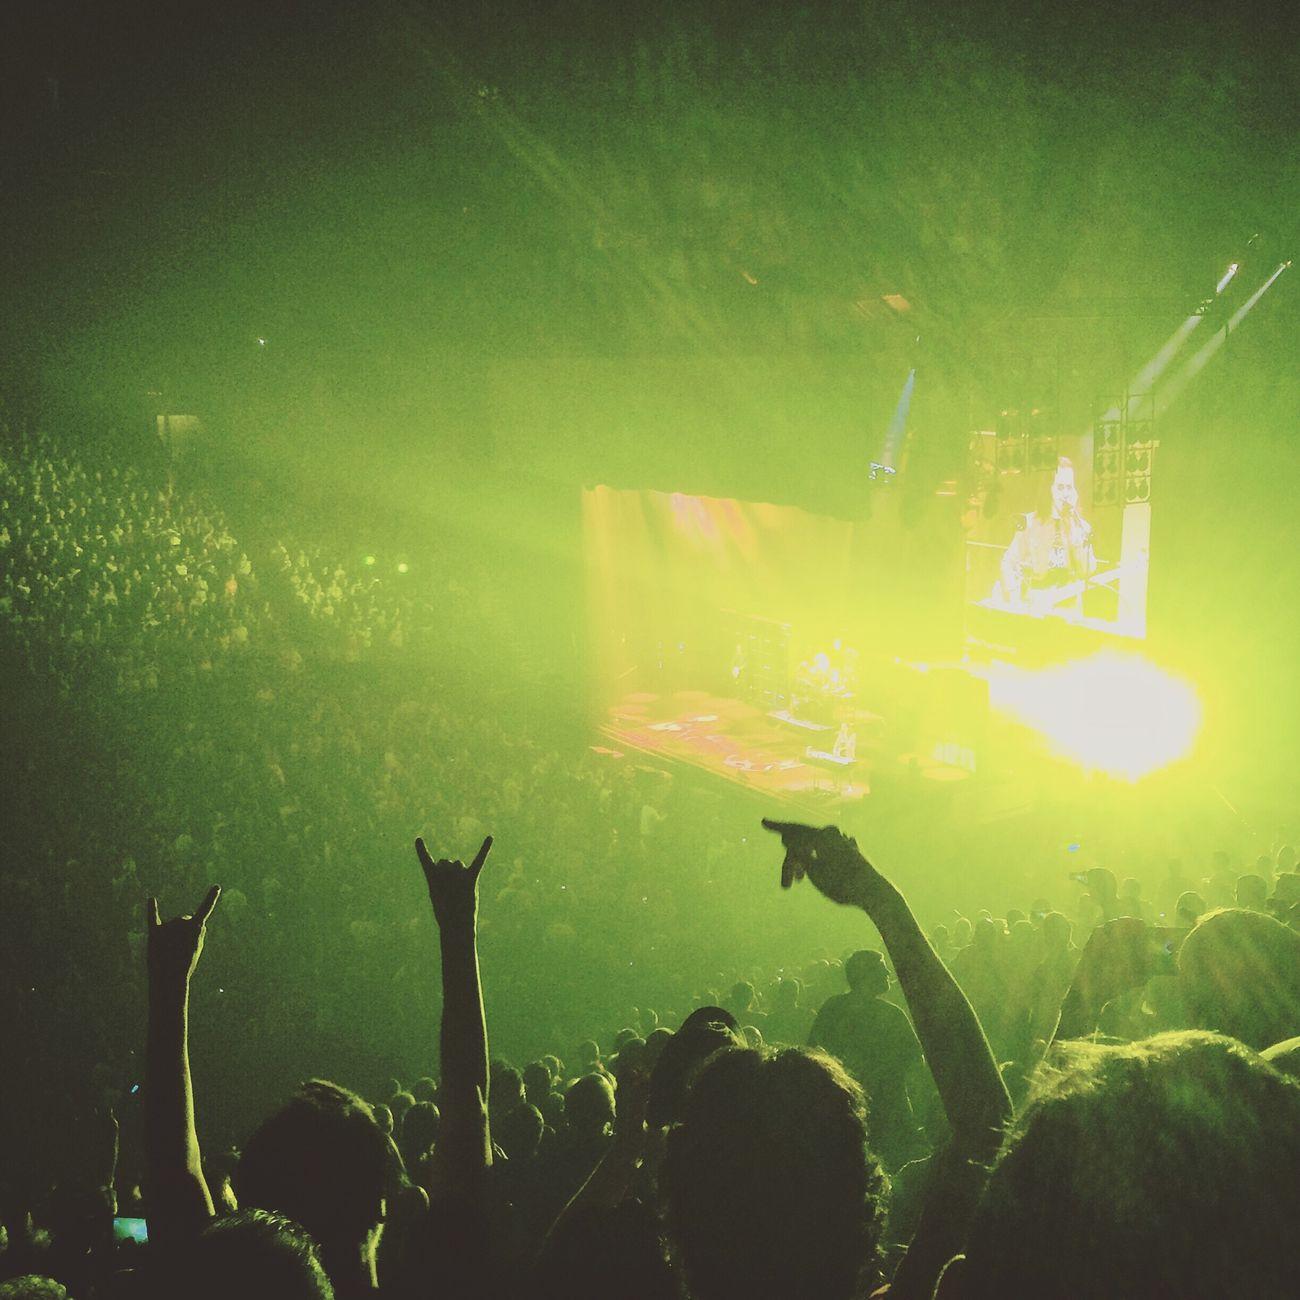 Concert Green Music Crowd